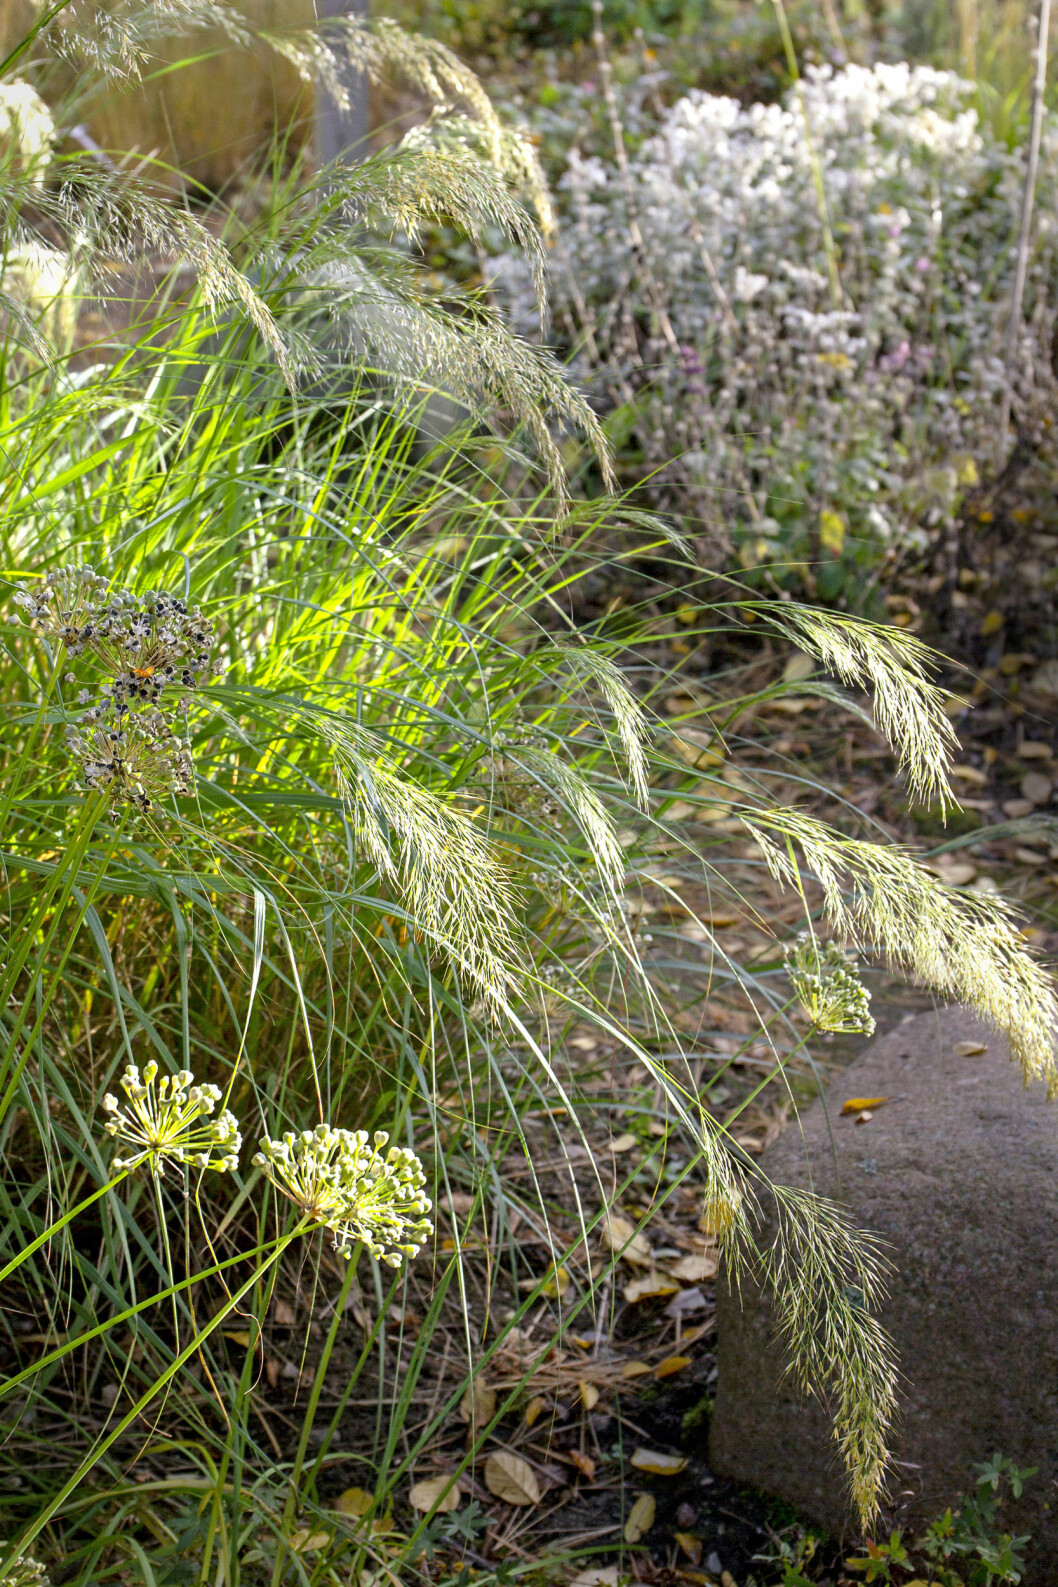 Eleganta silvergräset, Achnatherum calamagrostis, är mycket dekorativt. Blir ca 110 cm högt.